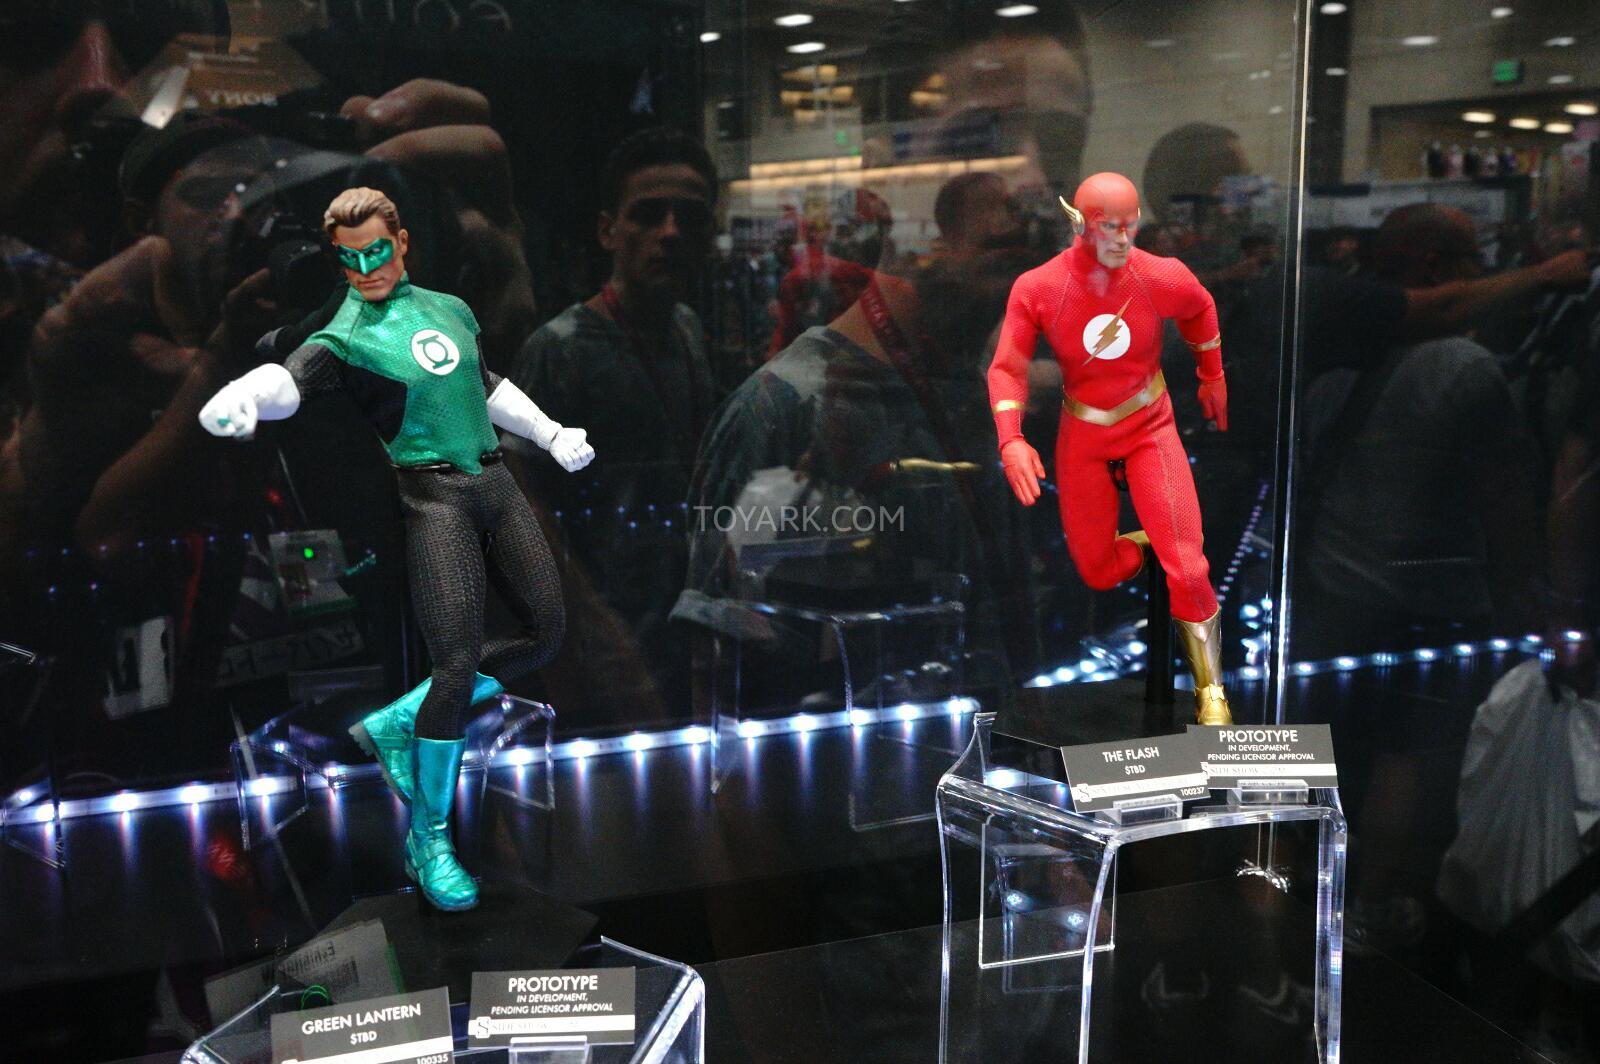 [Sideshow] DC Comics: Flash Sixth Scale Figure - Página 2 DSC07531